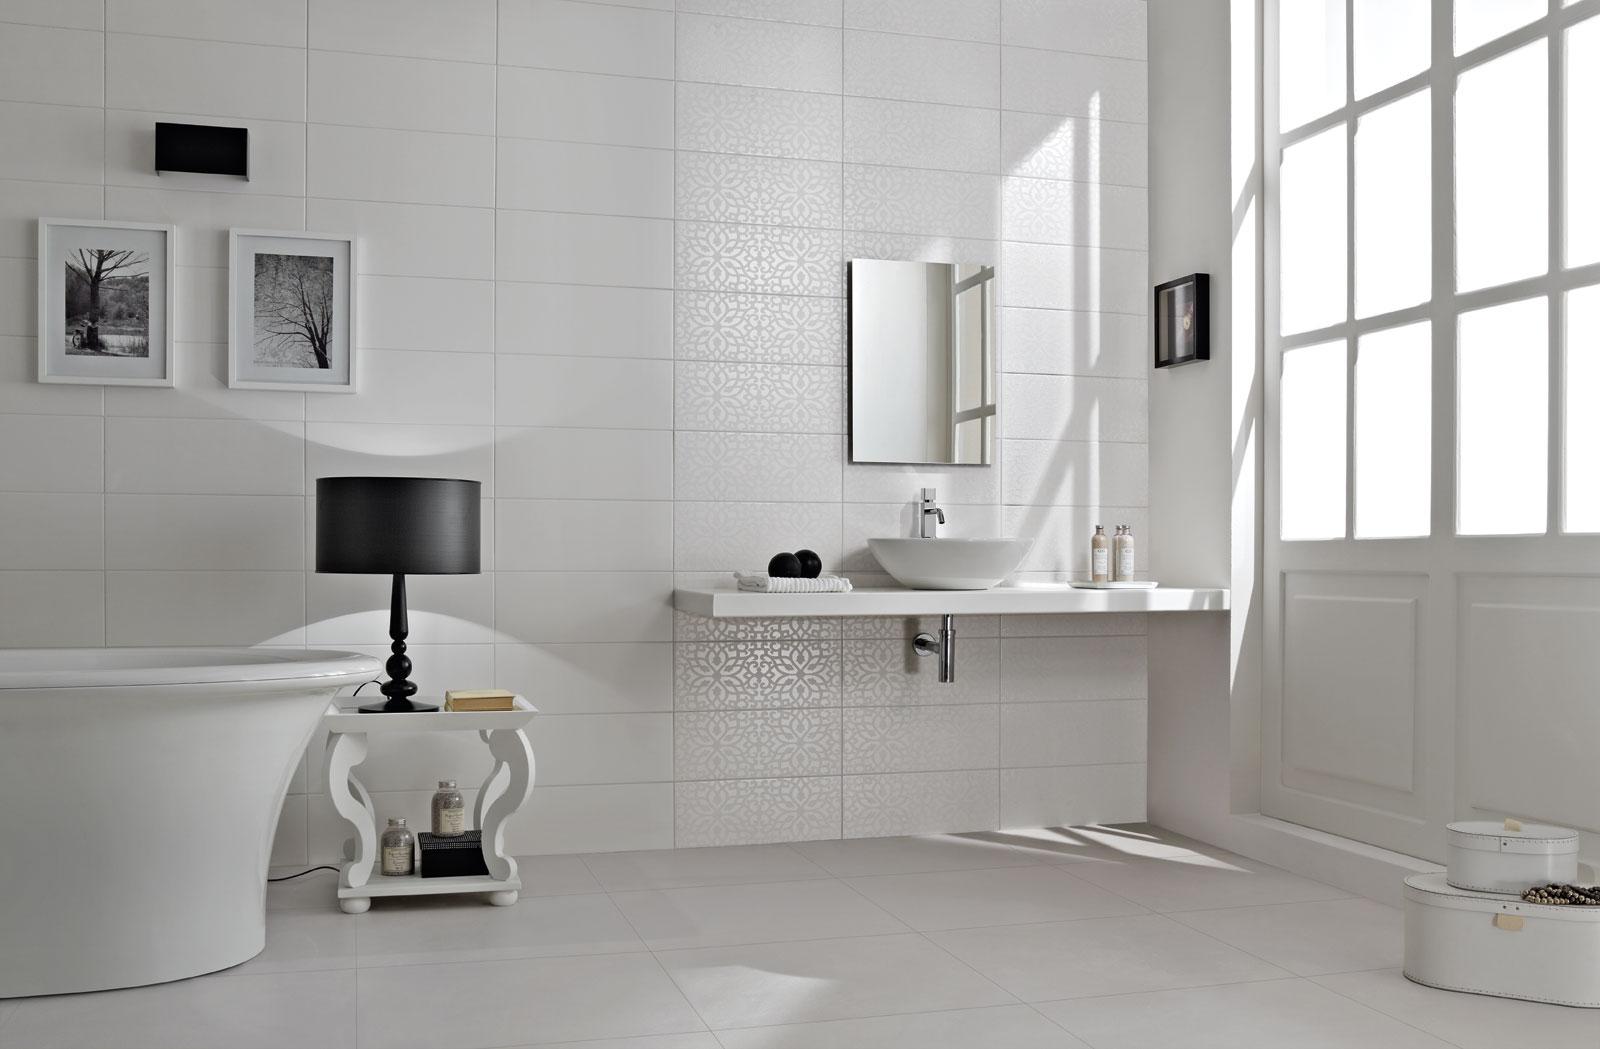 Piastrelle bagno bianche tw79 regardsdefemmes for Piastrelle bianche lucide pavimento